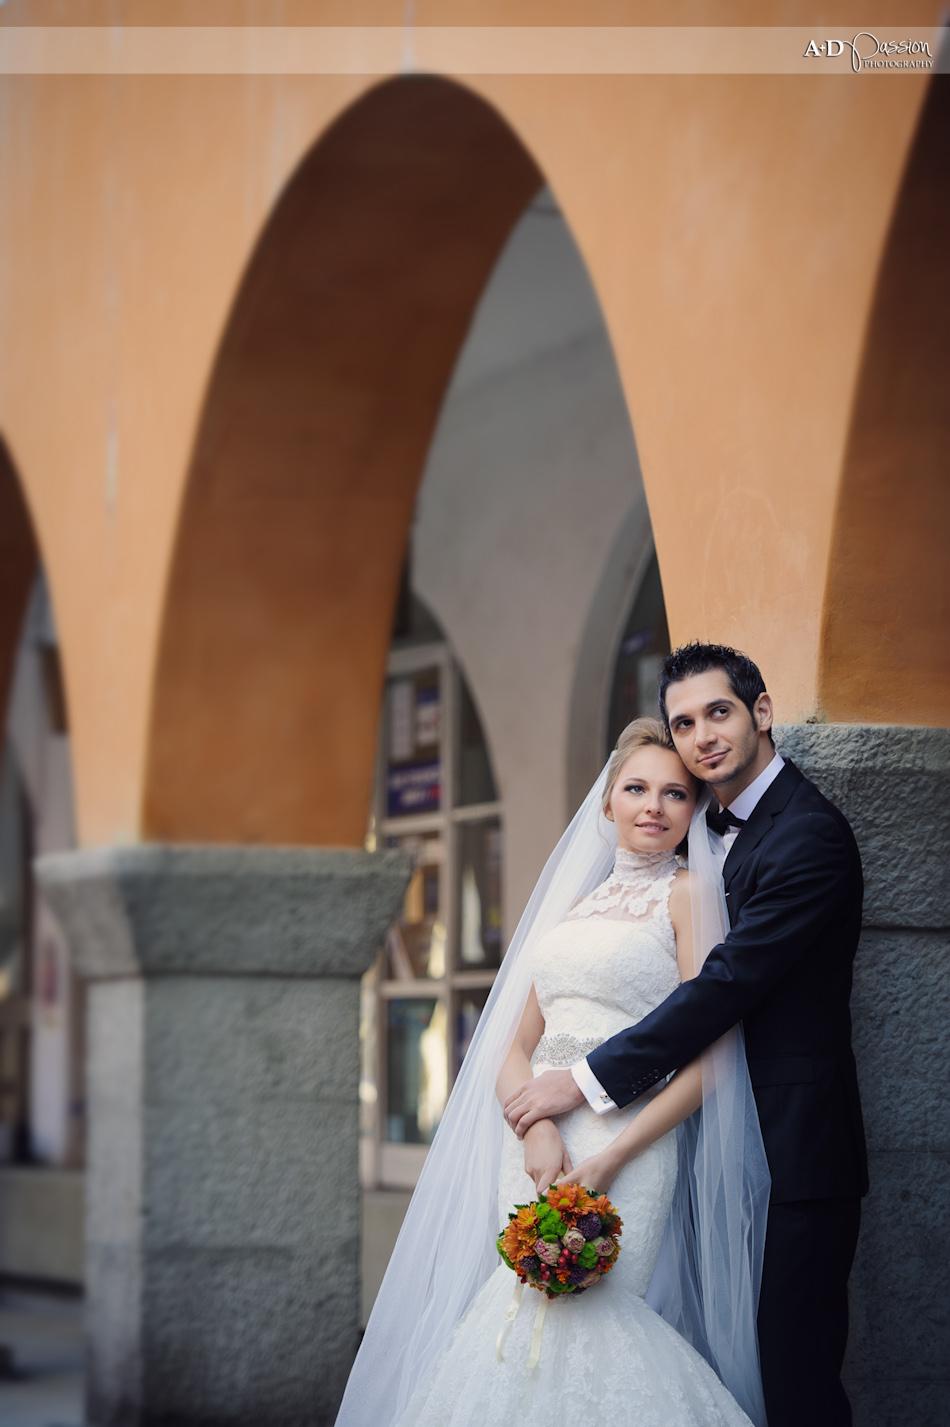 AD Passion Photography | ad-passion_fotograf-profesionist-nunta_poiana-brasov_after-wedding_trash-the-dress_nunta-brasov_fine-art-photography_iusti-si-antonia_0067 | Adelin, Dida, fotograf profesionist, fotograf de nunta, fotografie de nunta, fotograf Timisoara, fotograf Craiova, fotograf Bucuresti, fotograf Arad, nunta Timisoara, nunta Arad, nunta Bucuresti, nunta Craiova